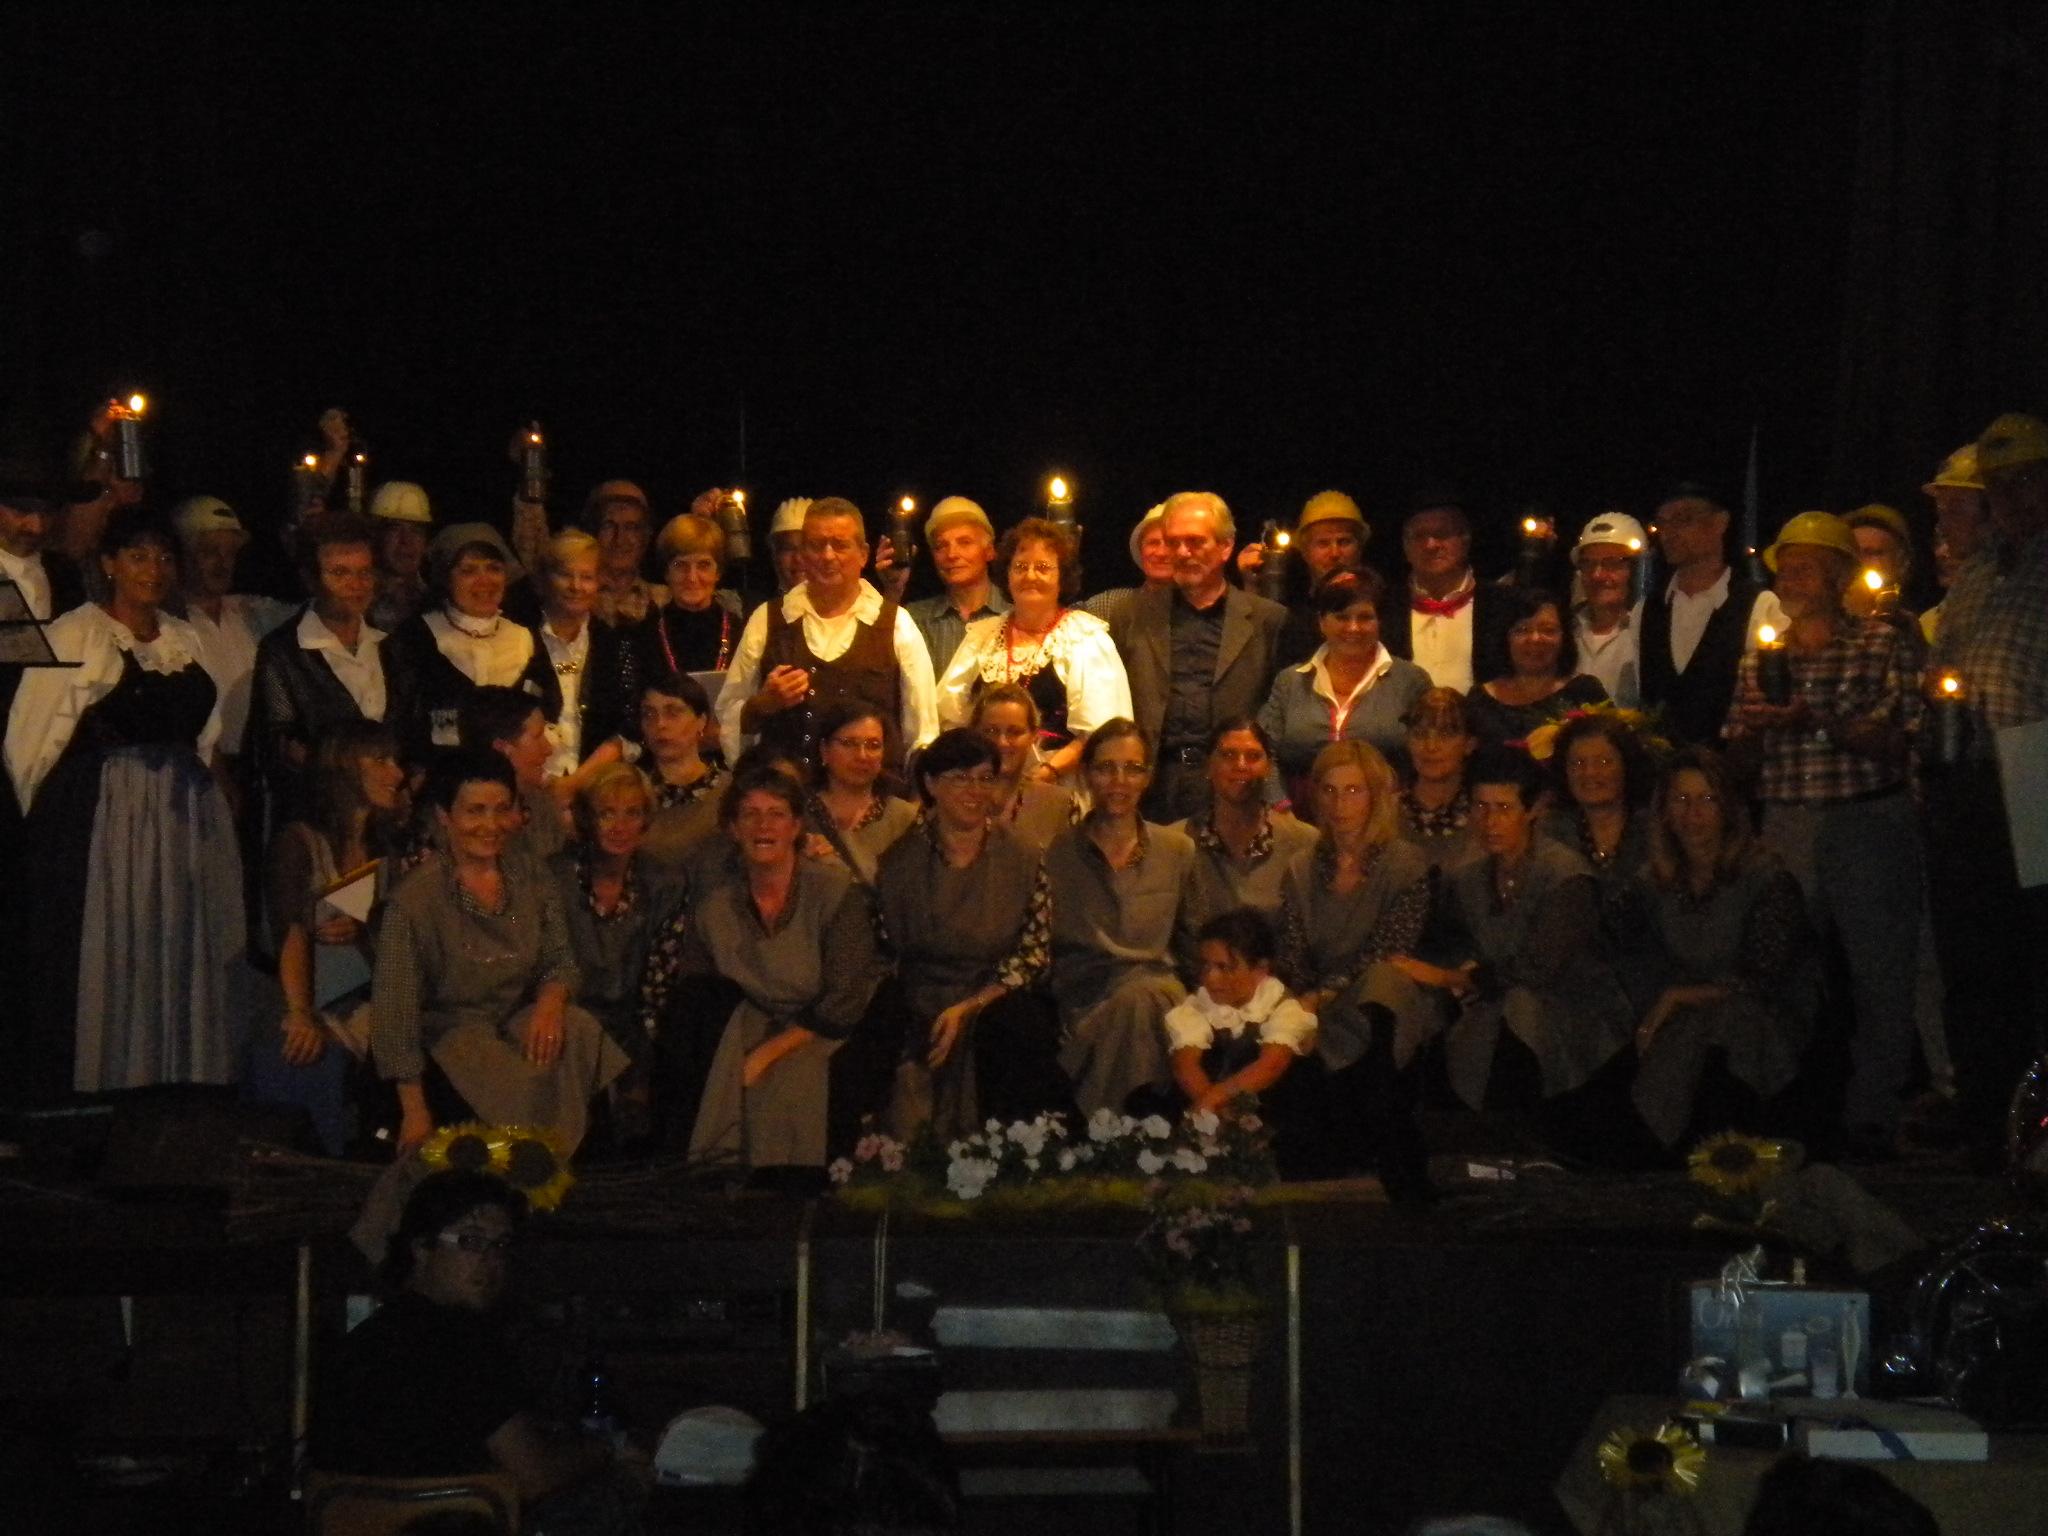 Taissine minatori e gruppi folklorici